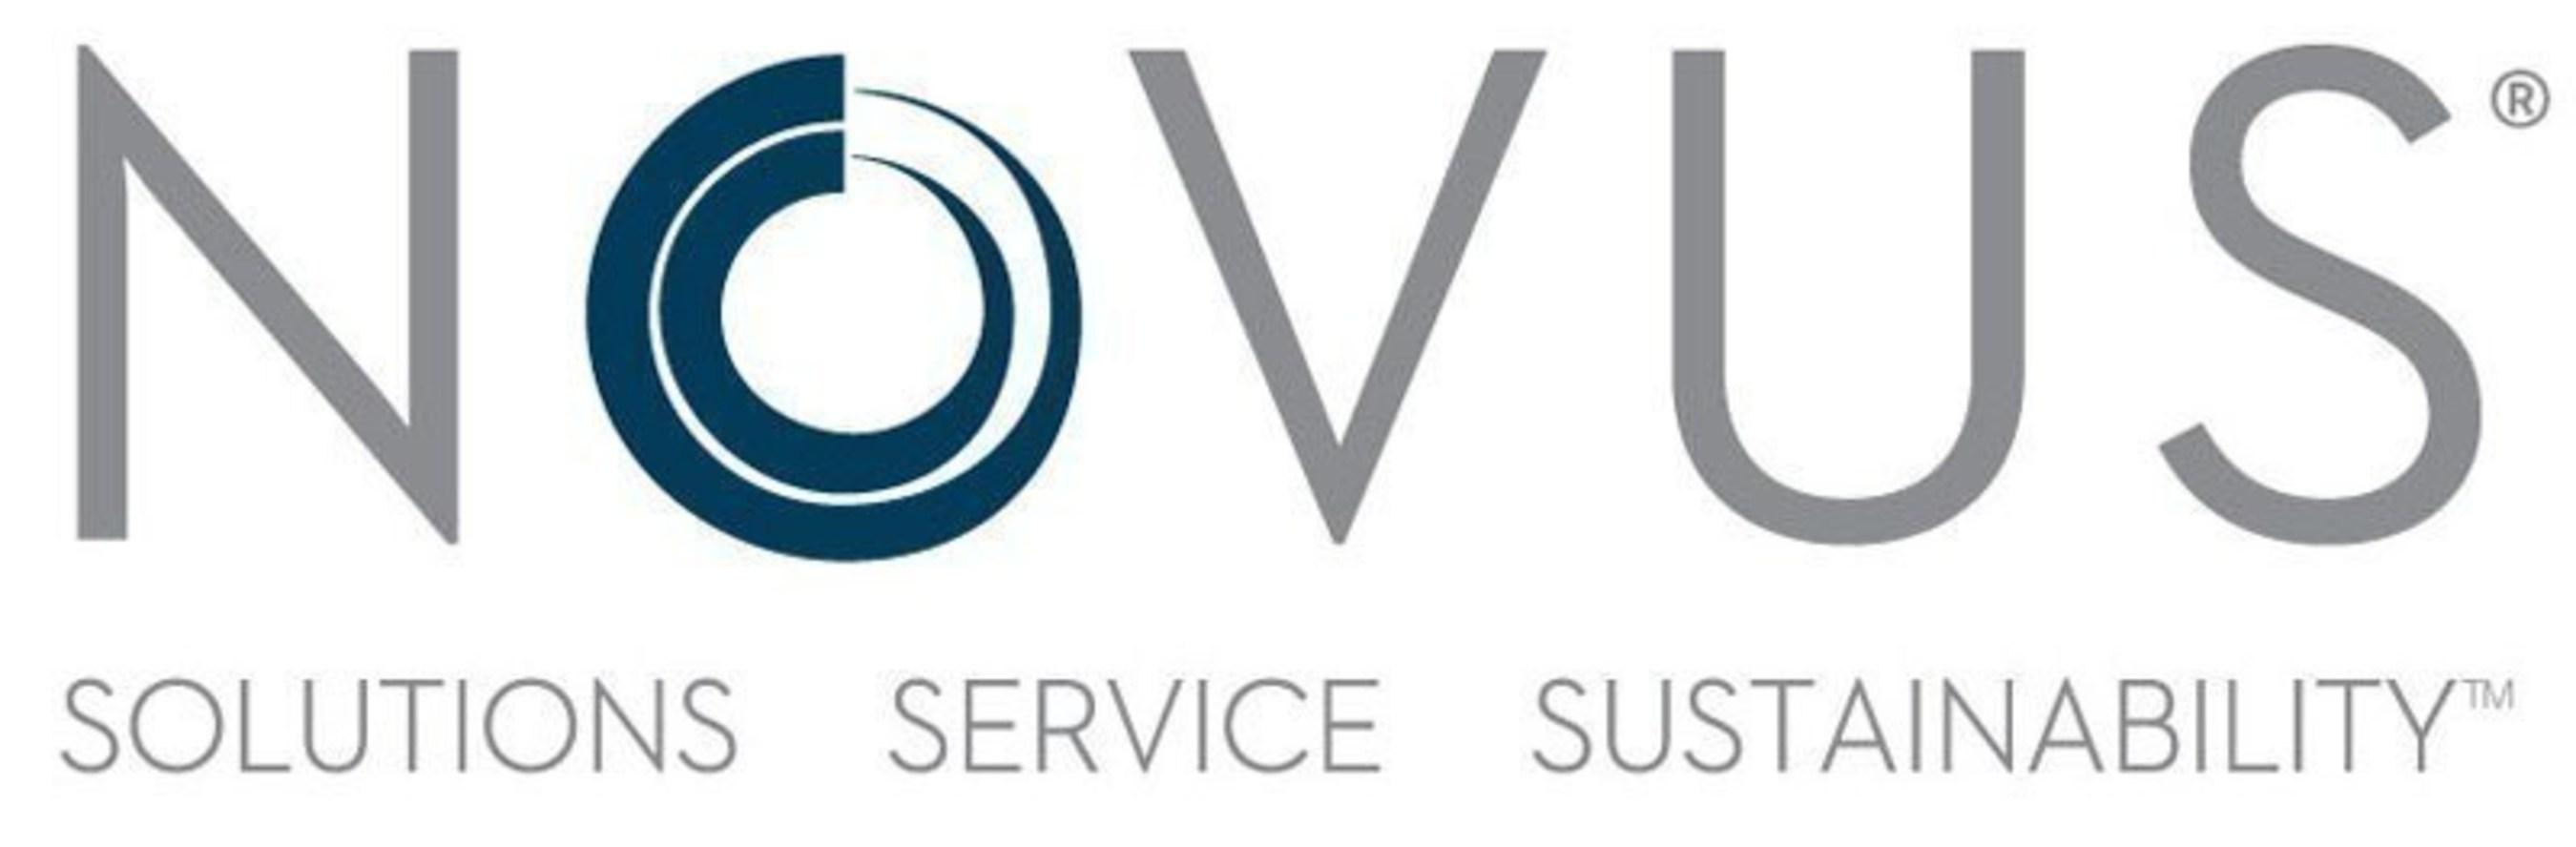 Novus International Joins The Sustainability Consortium®